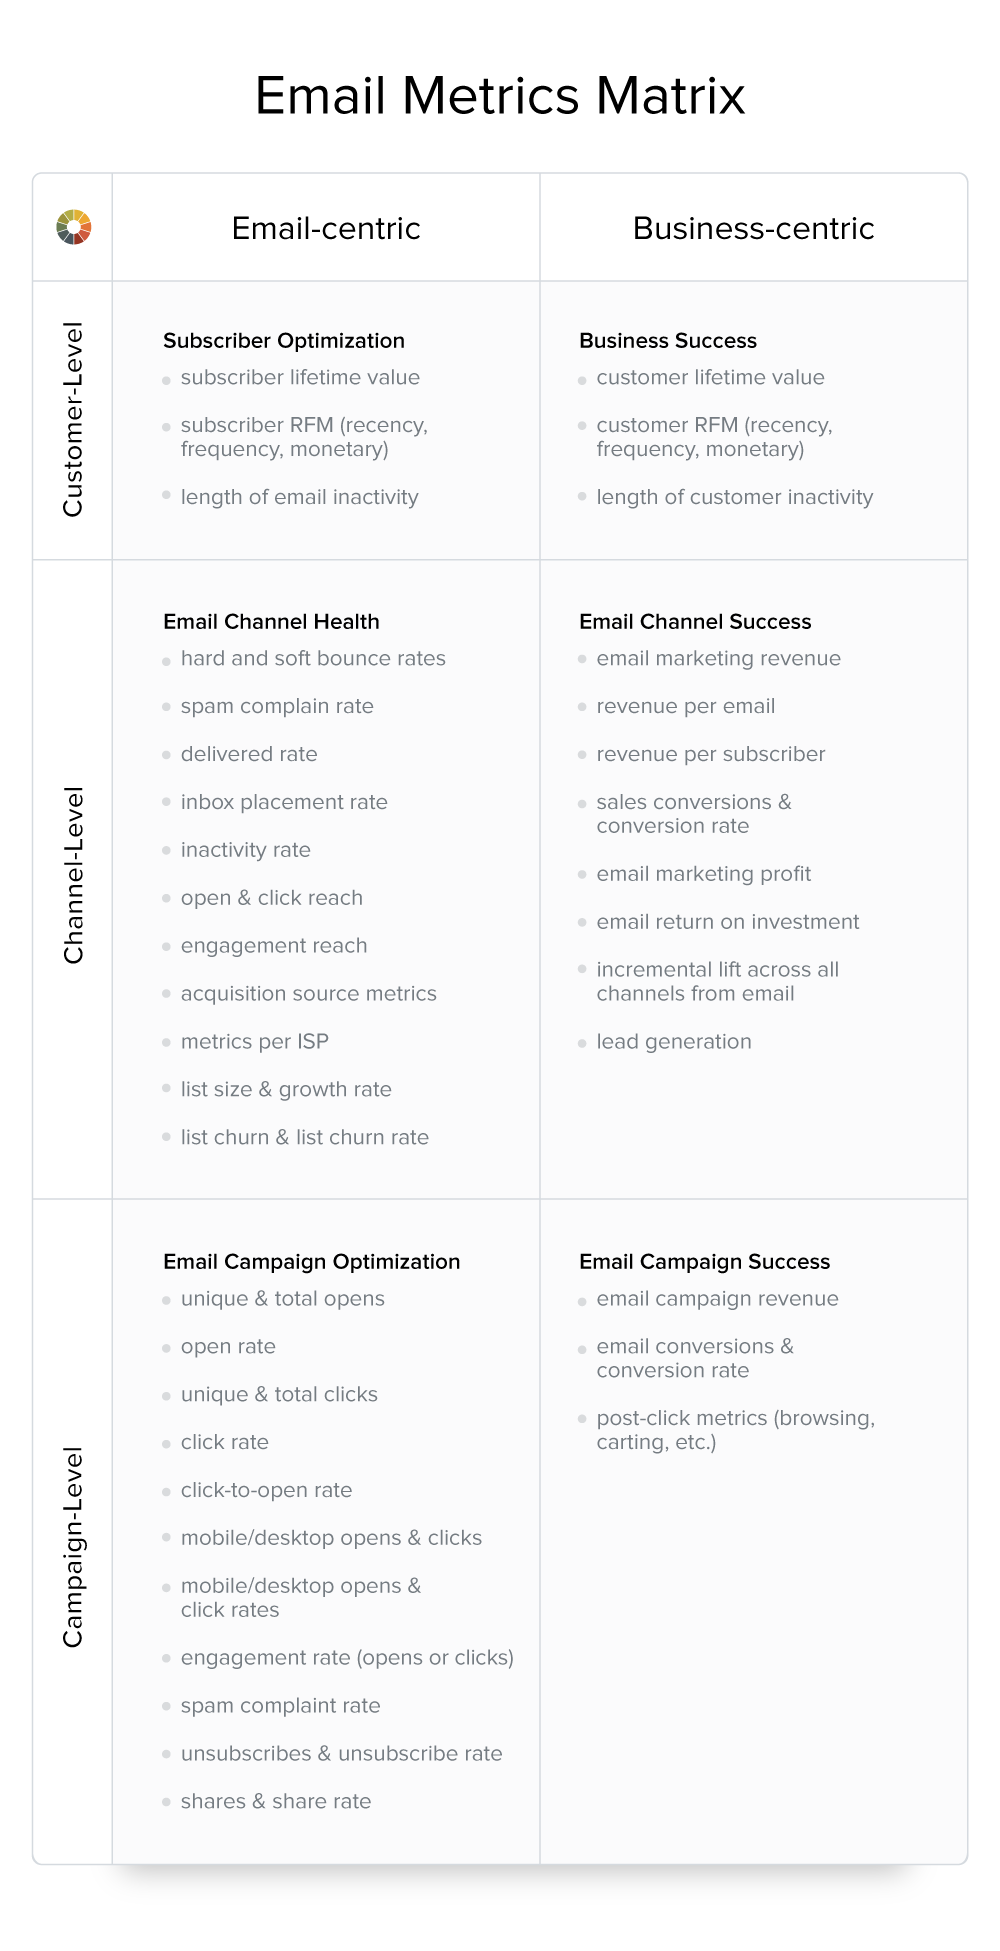 Email Metrics Matrix